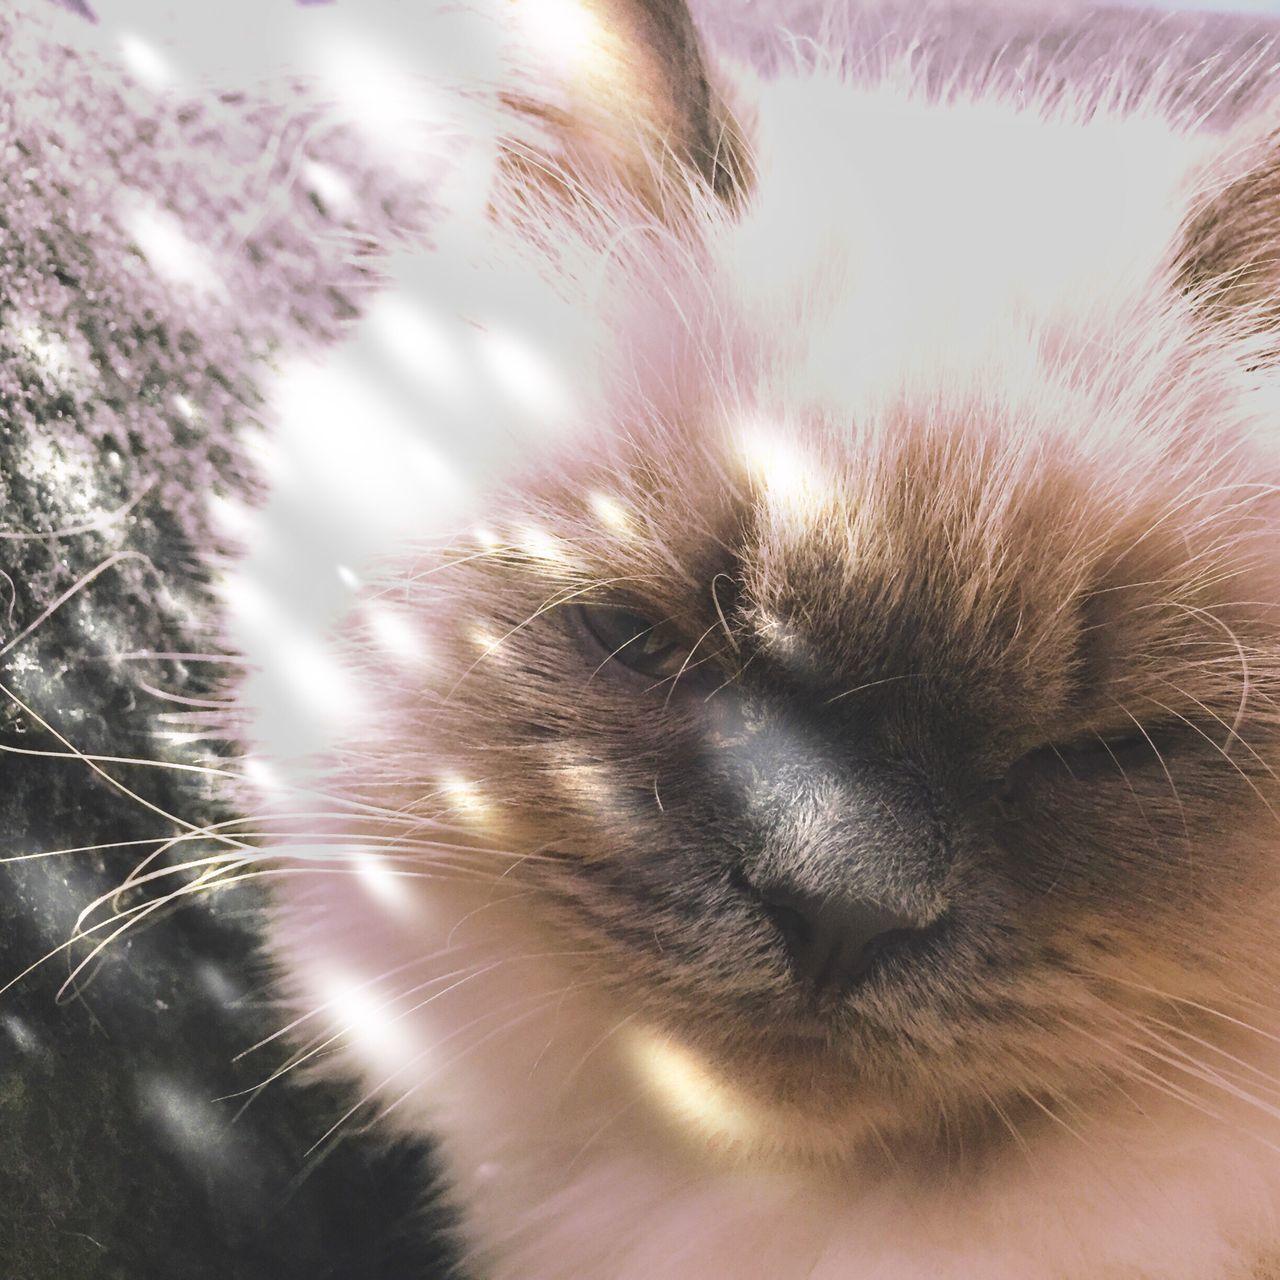 One Animal Cat Animal Themes Close-up Indoors  Snapshots Of Life Portrait Mobilephotography Eyem Best Shots